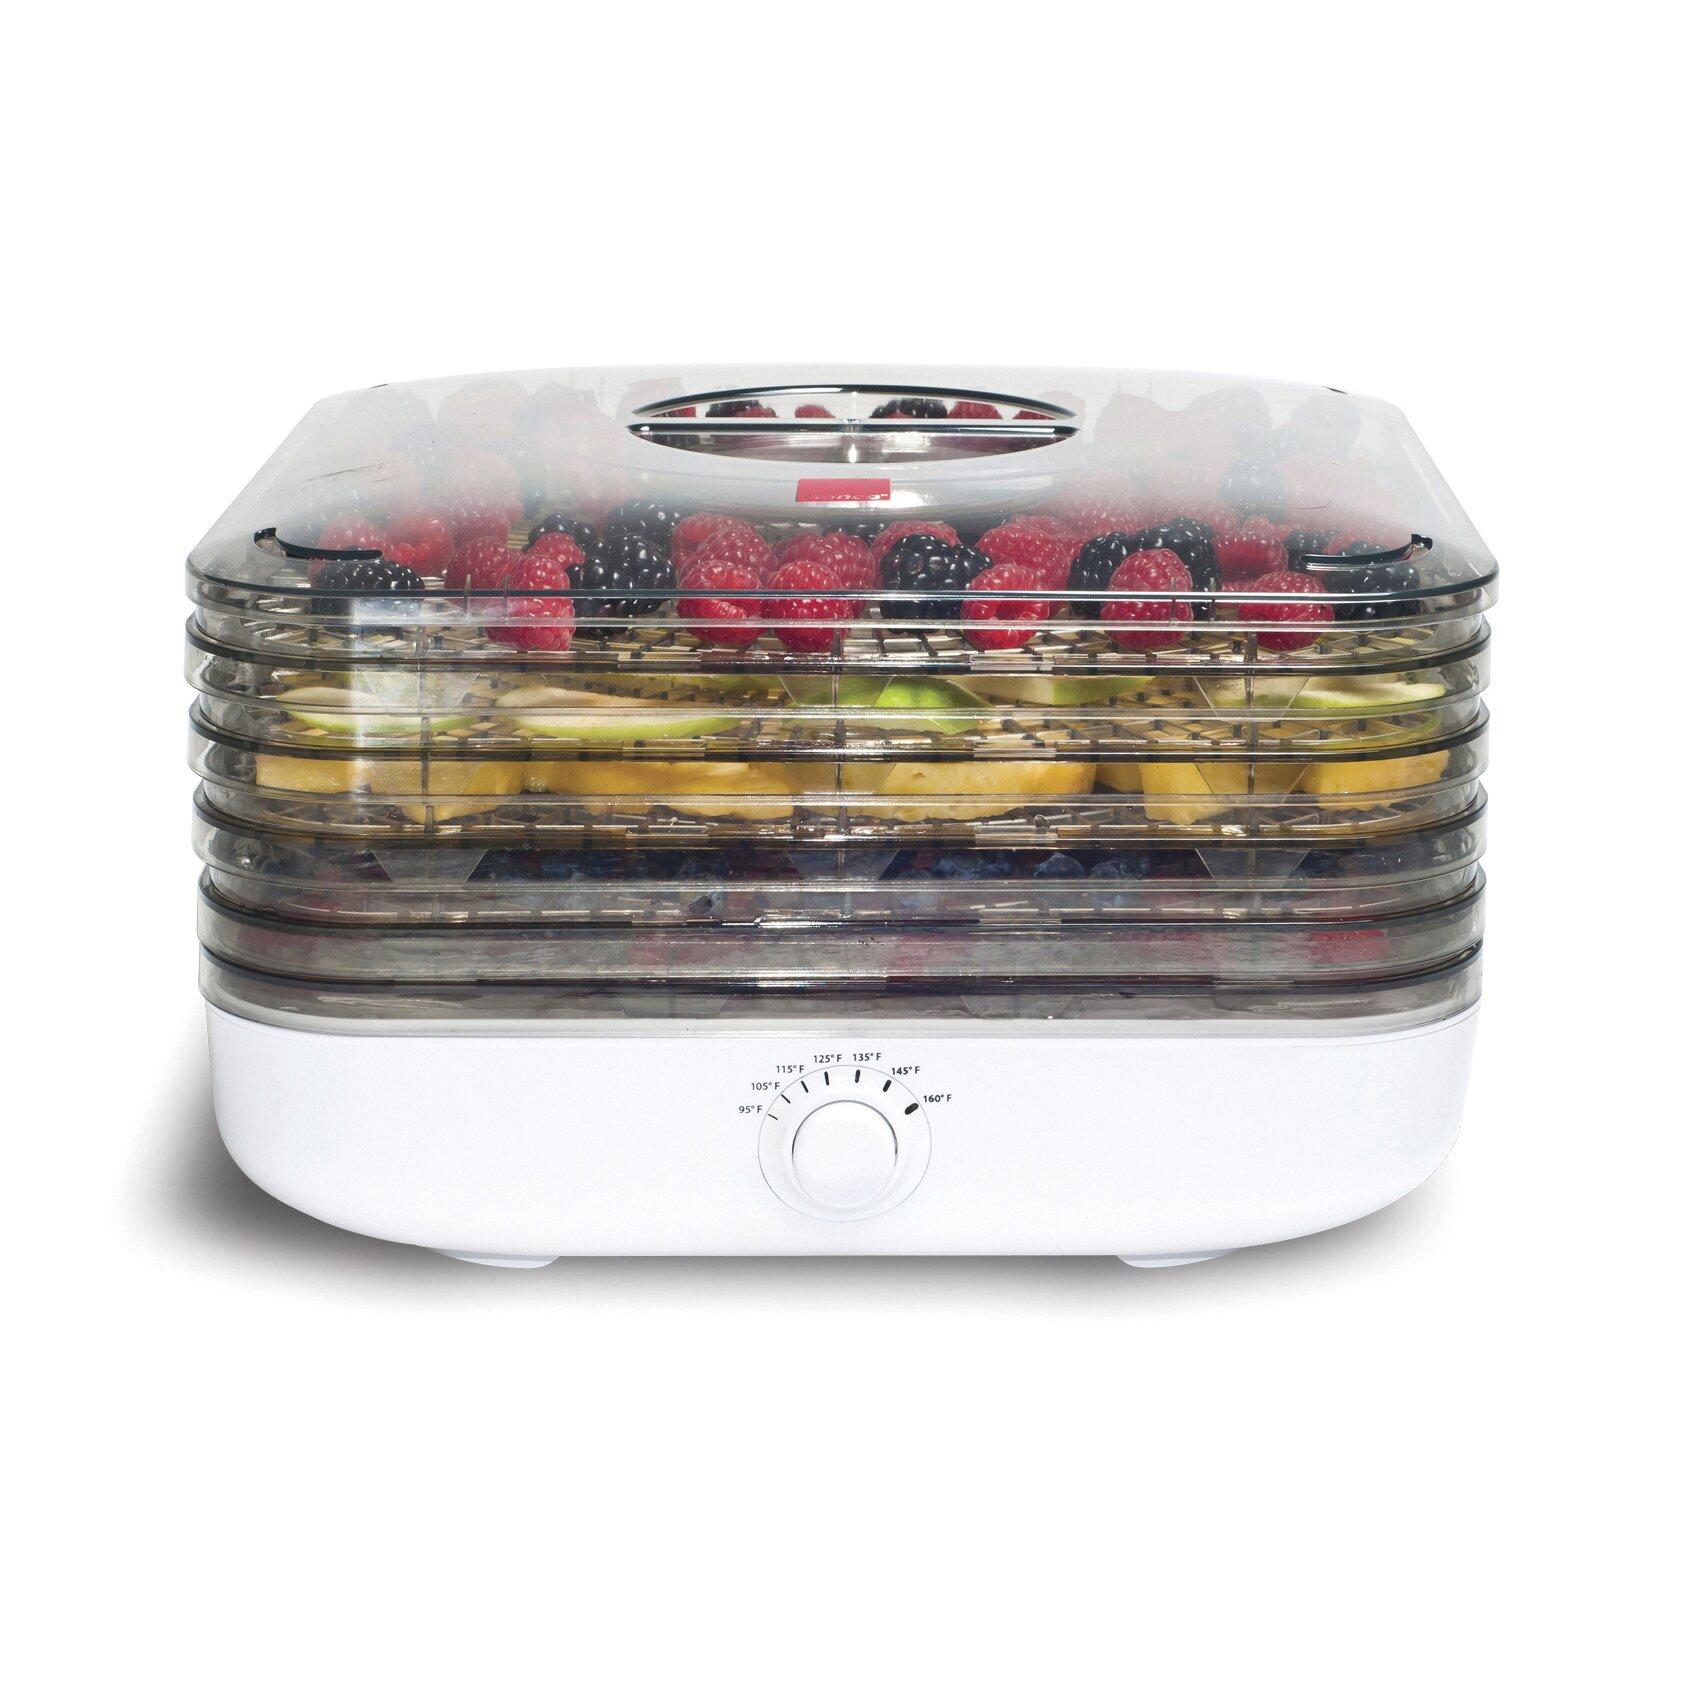 Ronco Ez Store Turbo Food Dehydrator Reviews